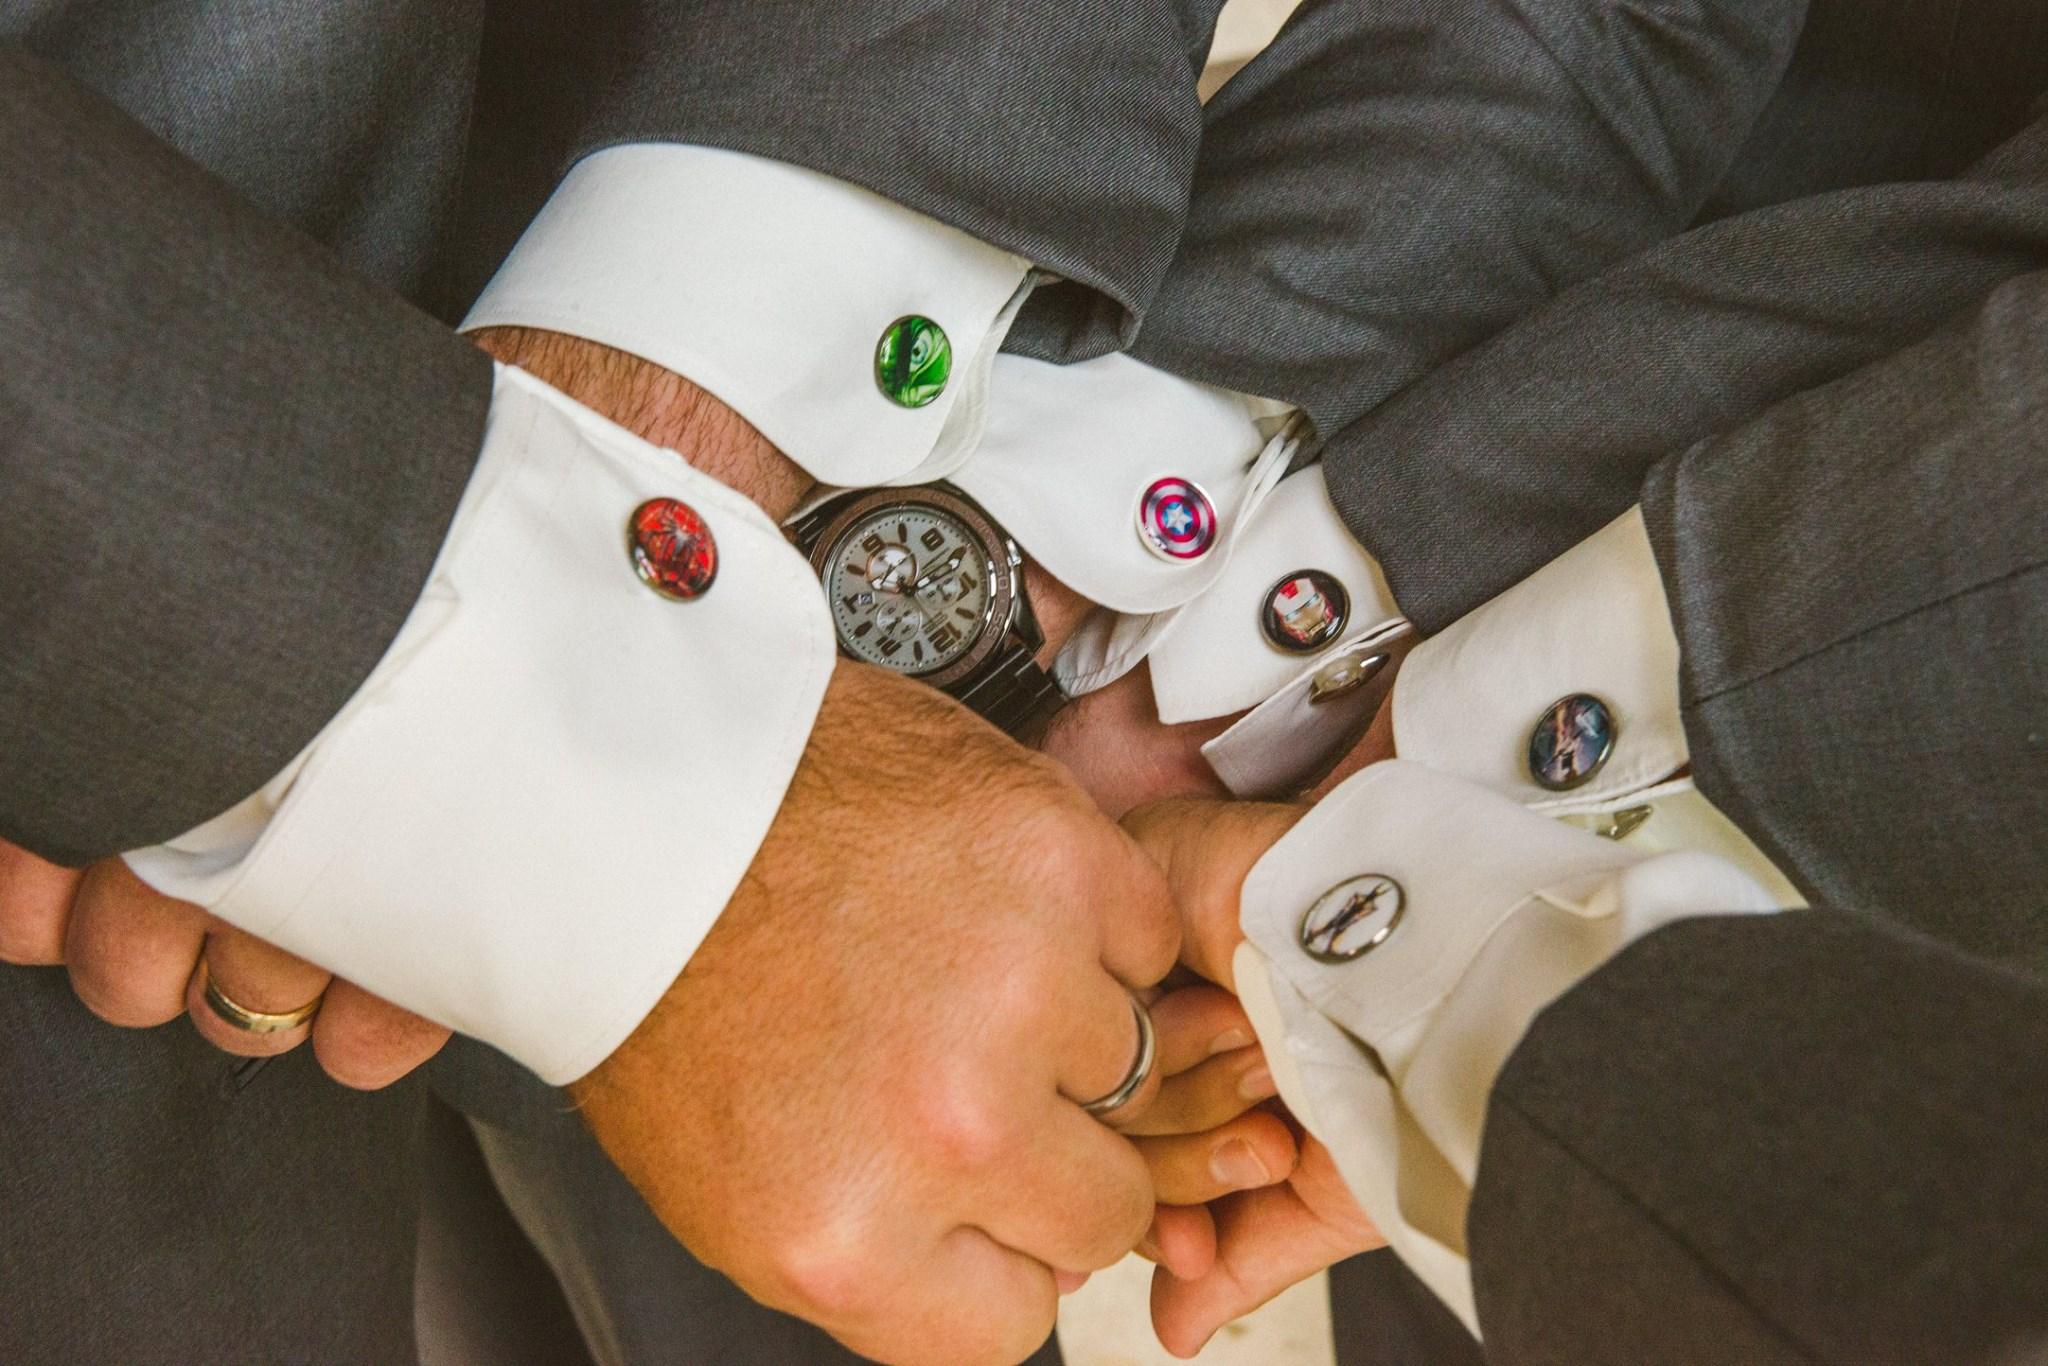 mudvayne_triangle_new_logo_cuff_links_men_weddings_grooms_groomsmen_gifts_dads_graduations_cufflinks_5.jpg